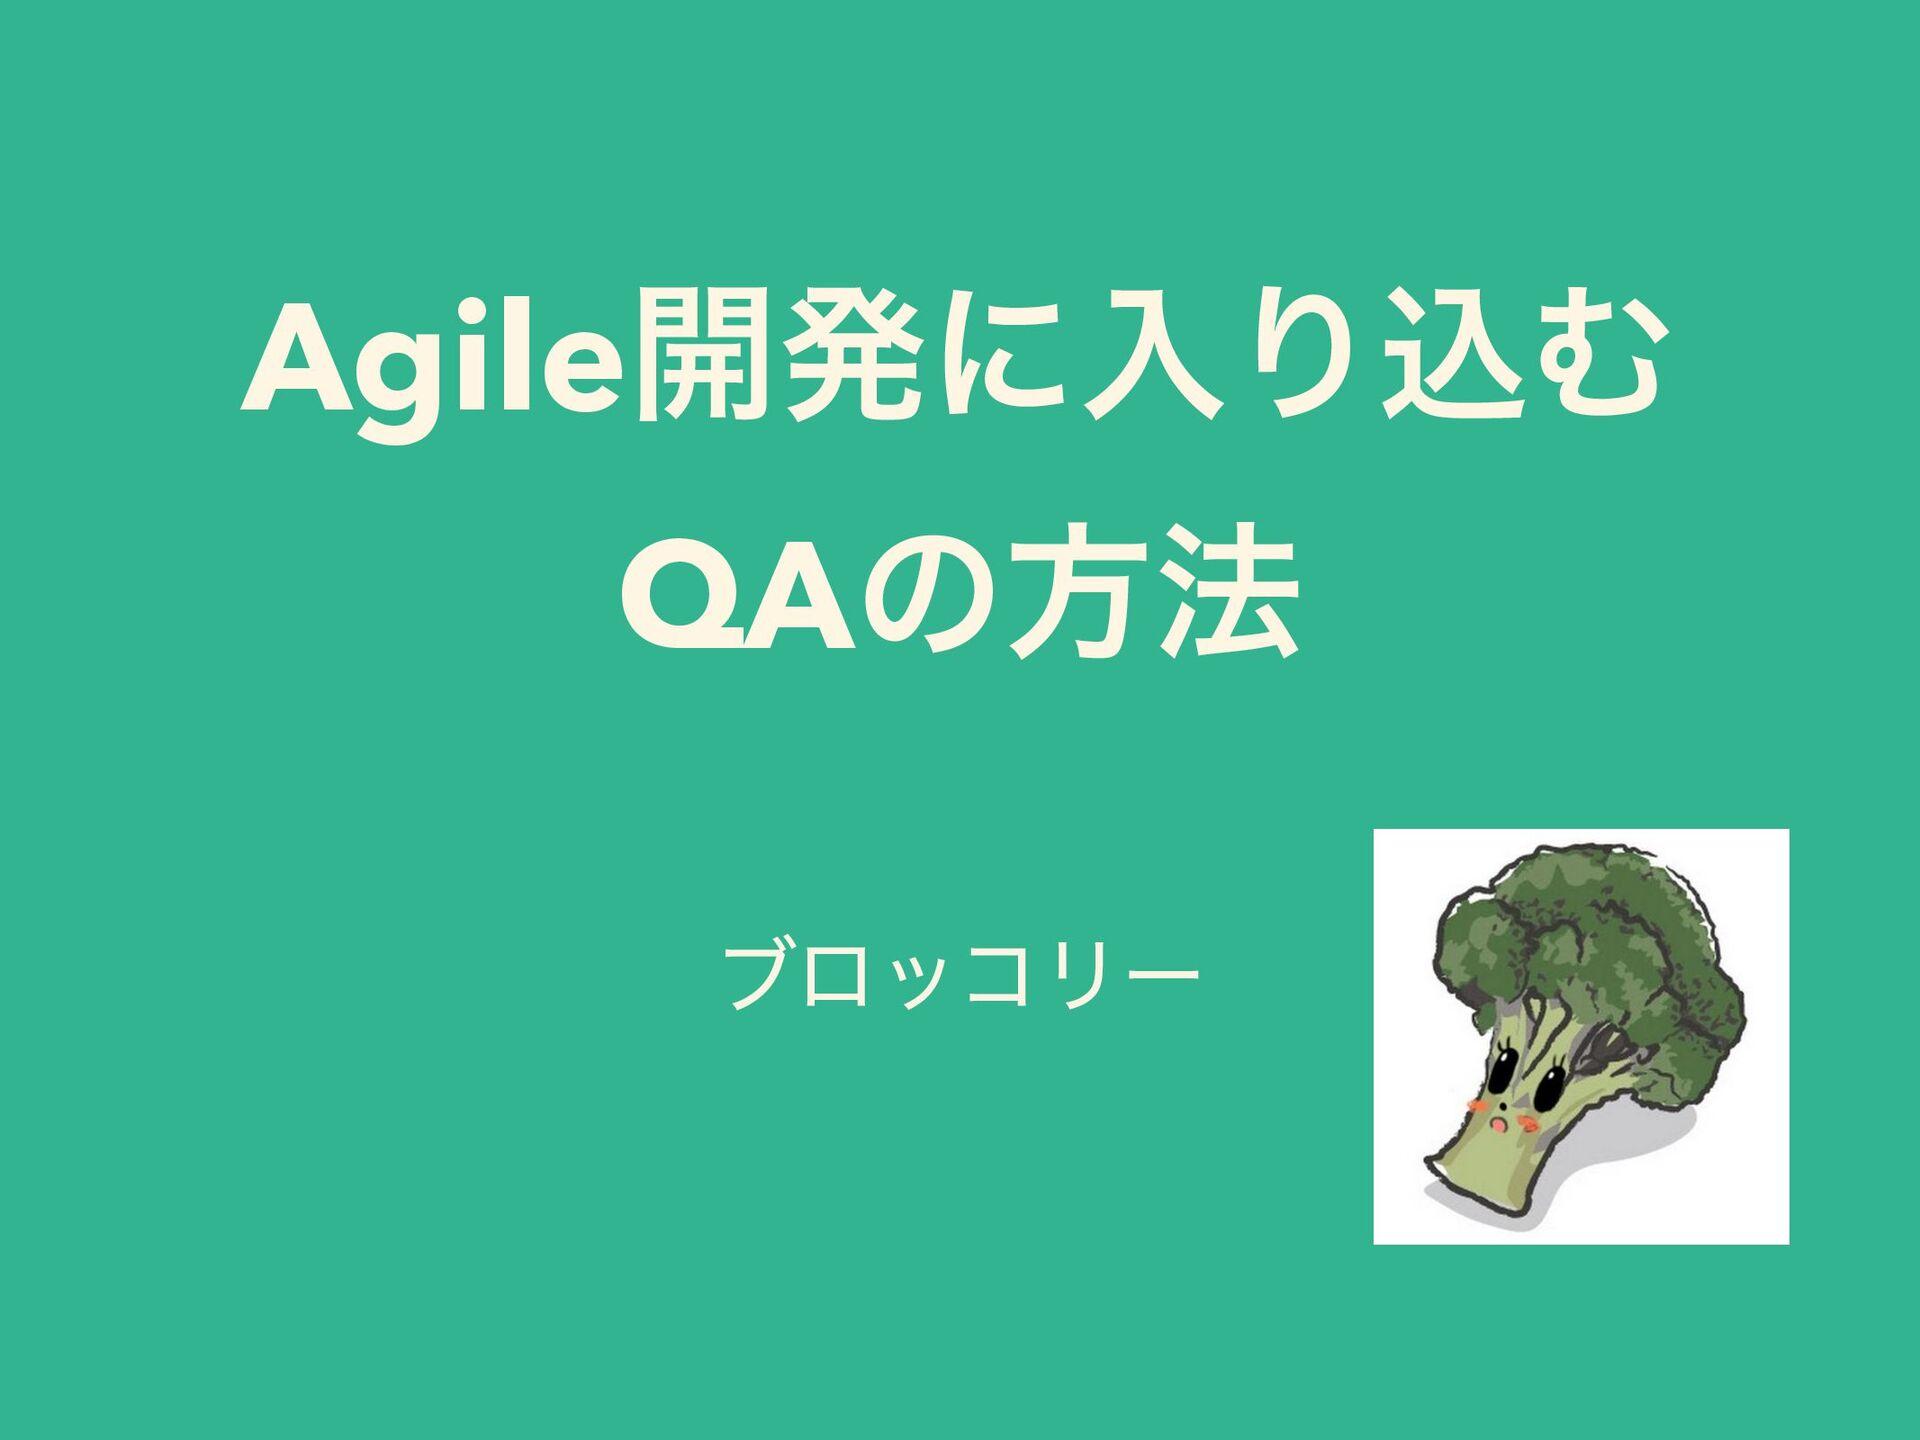 Agile։ൃʹೖΓࠐΉ QAͷํ๏ ϒϩοίϦʔ